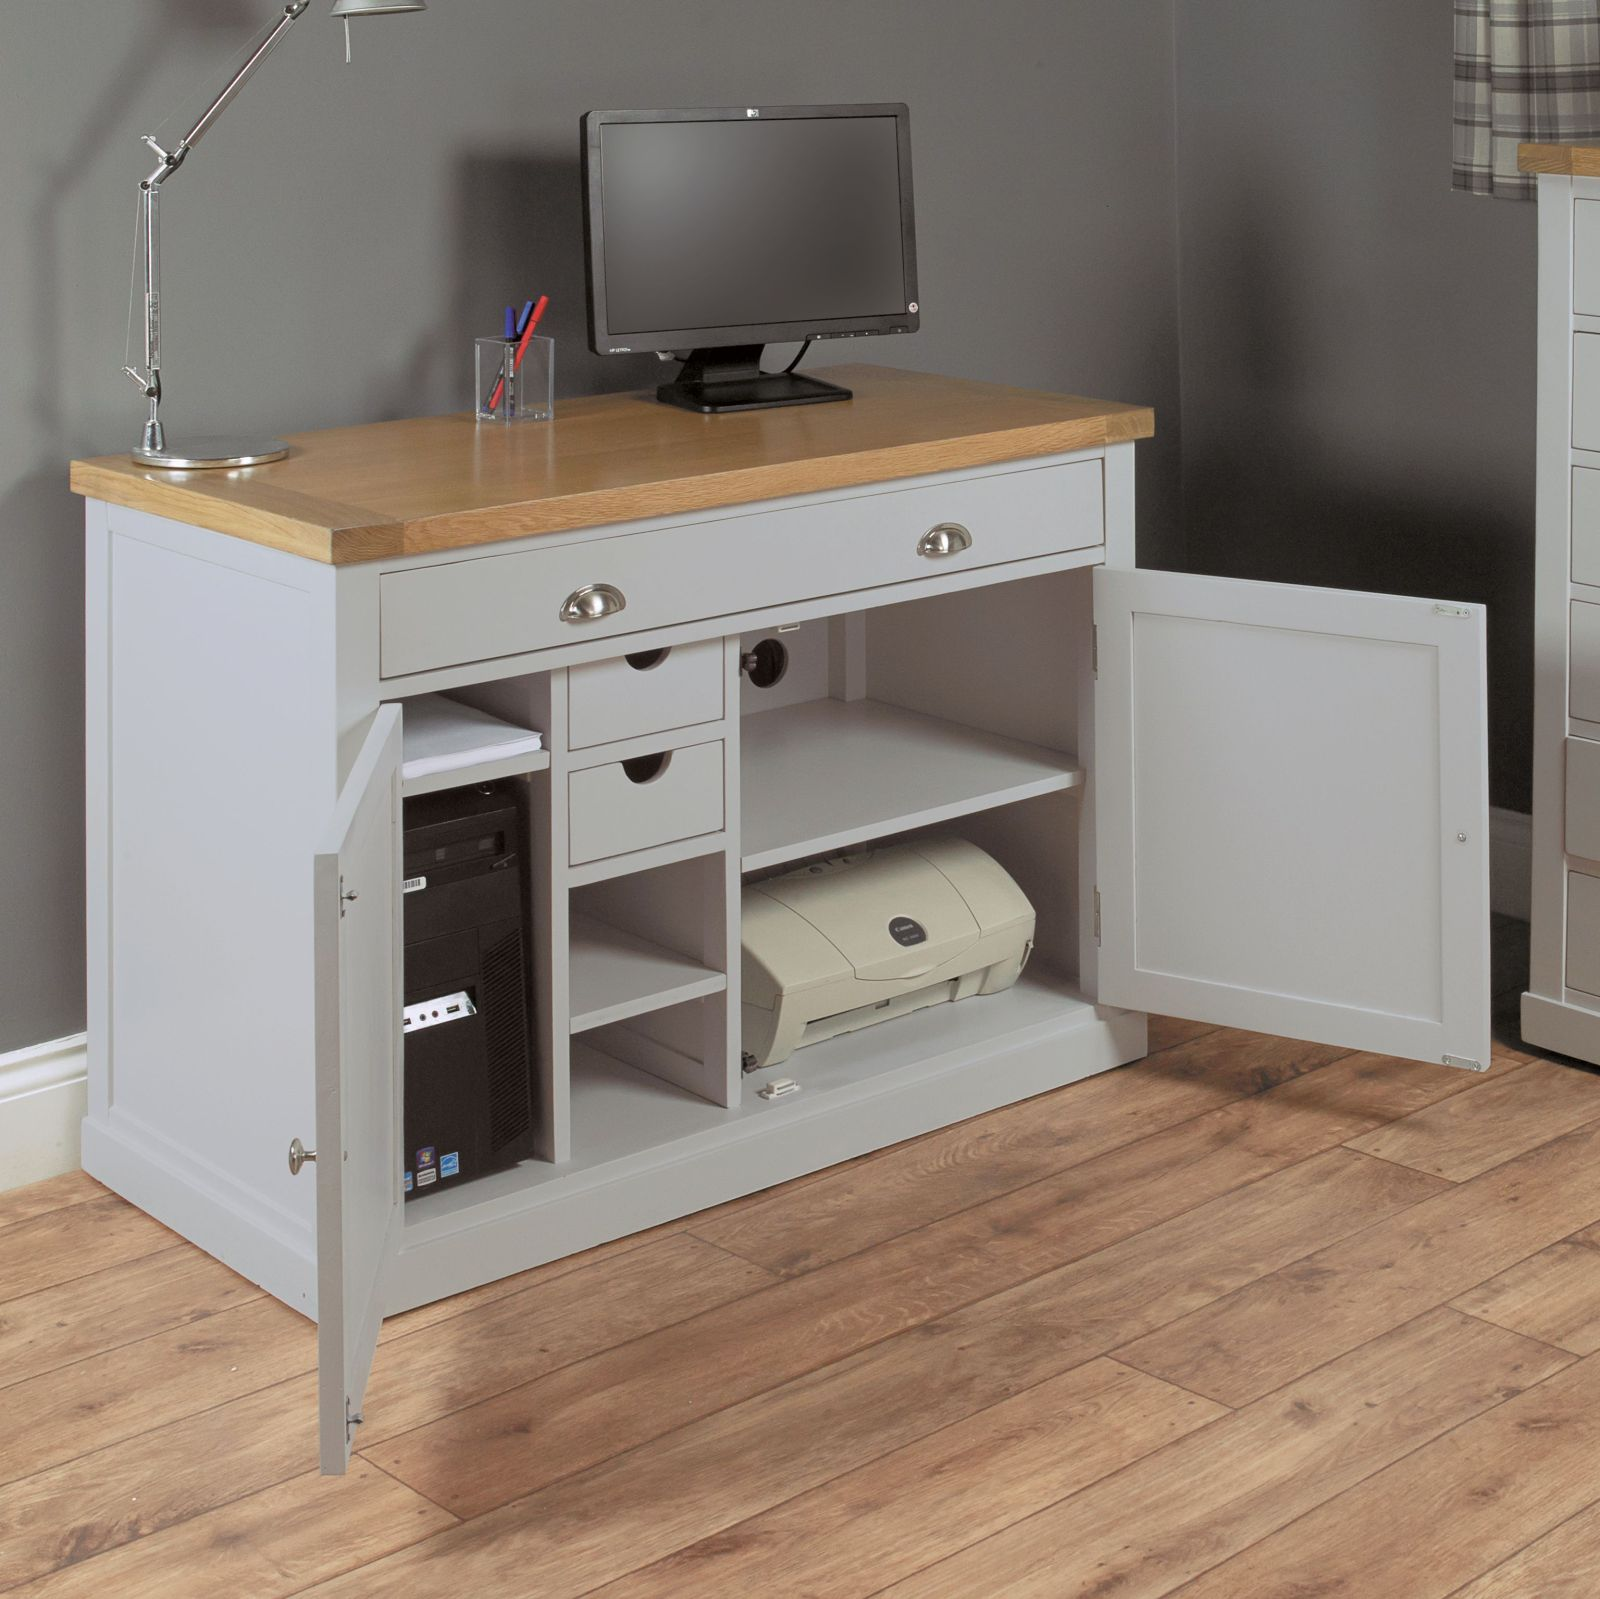 Nara Grey Painted Oak Furniture Hideaway Office PC